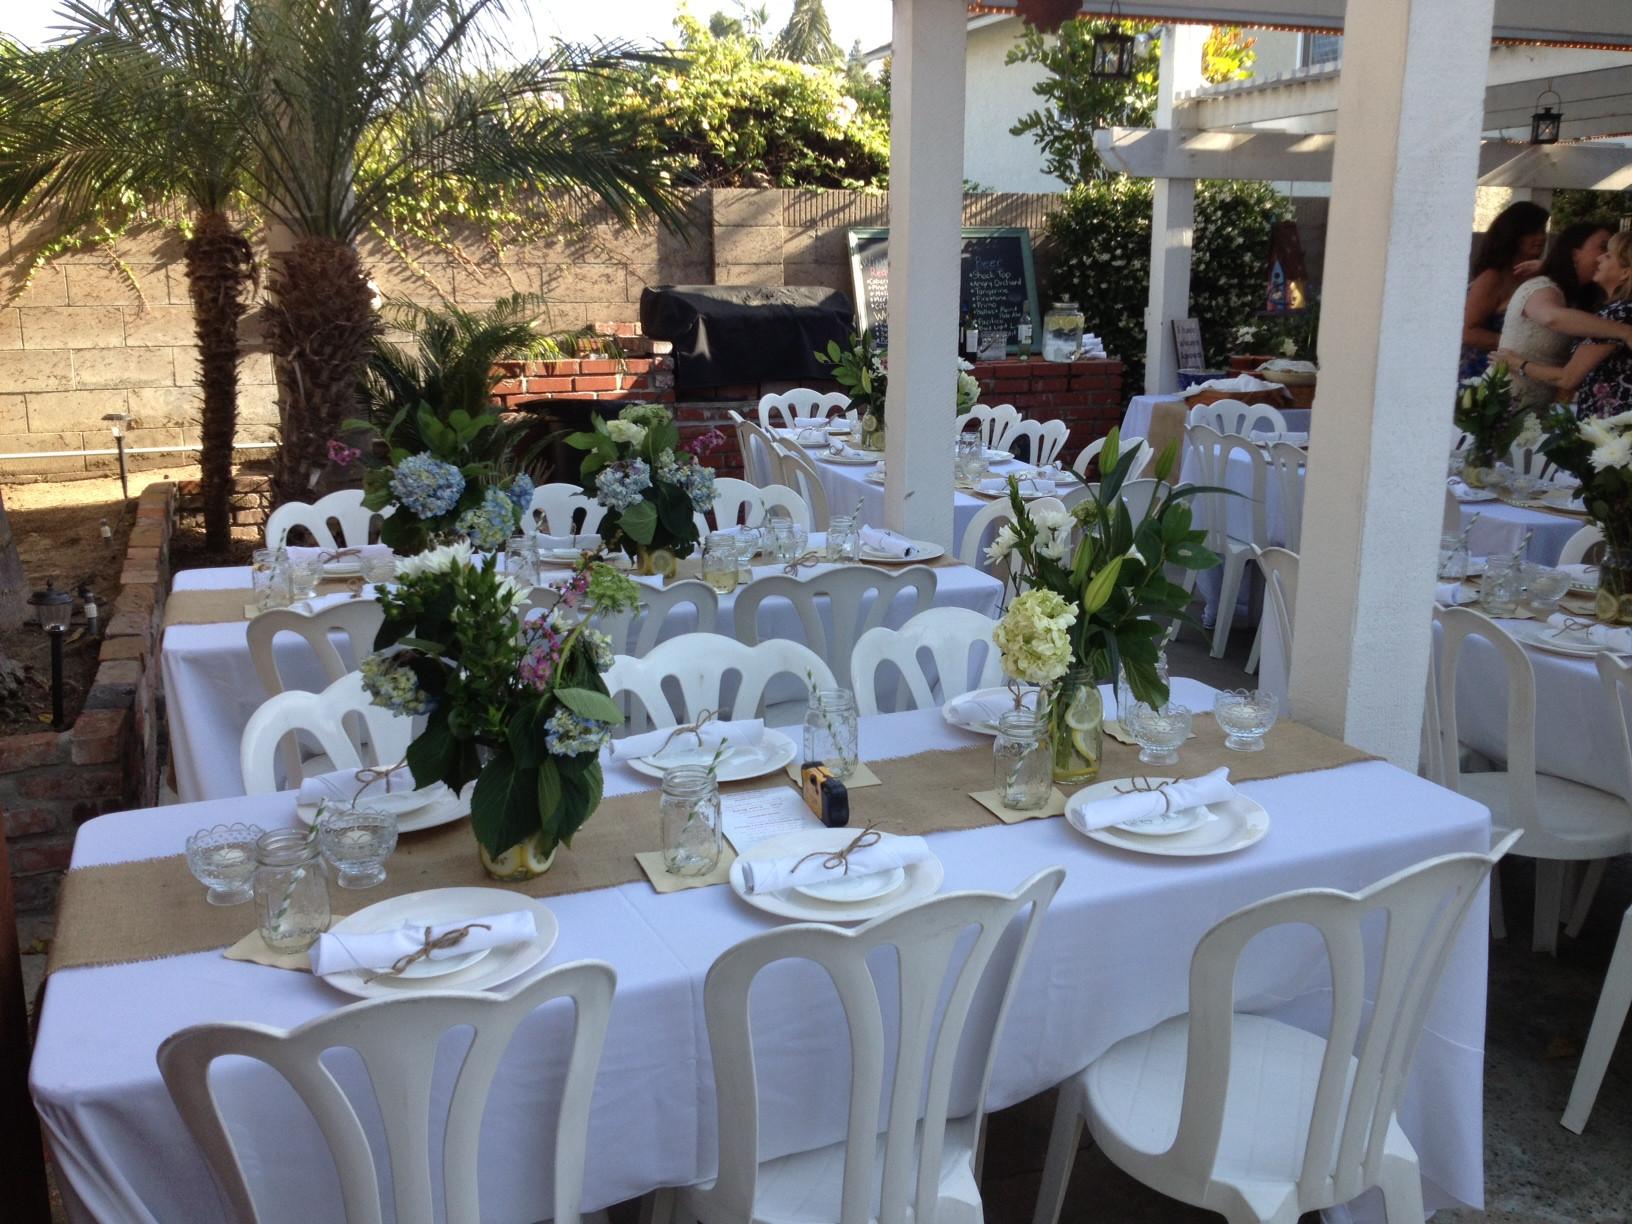 Best ideas about DIY Wedding Reception Ideas . Save or Pin Backyard DIY Wedding Reception Now.